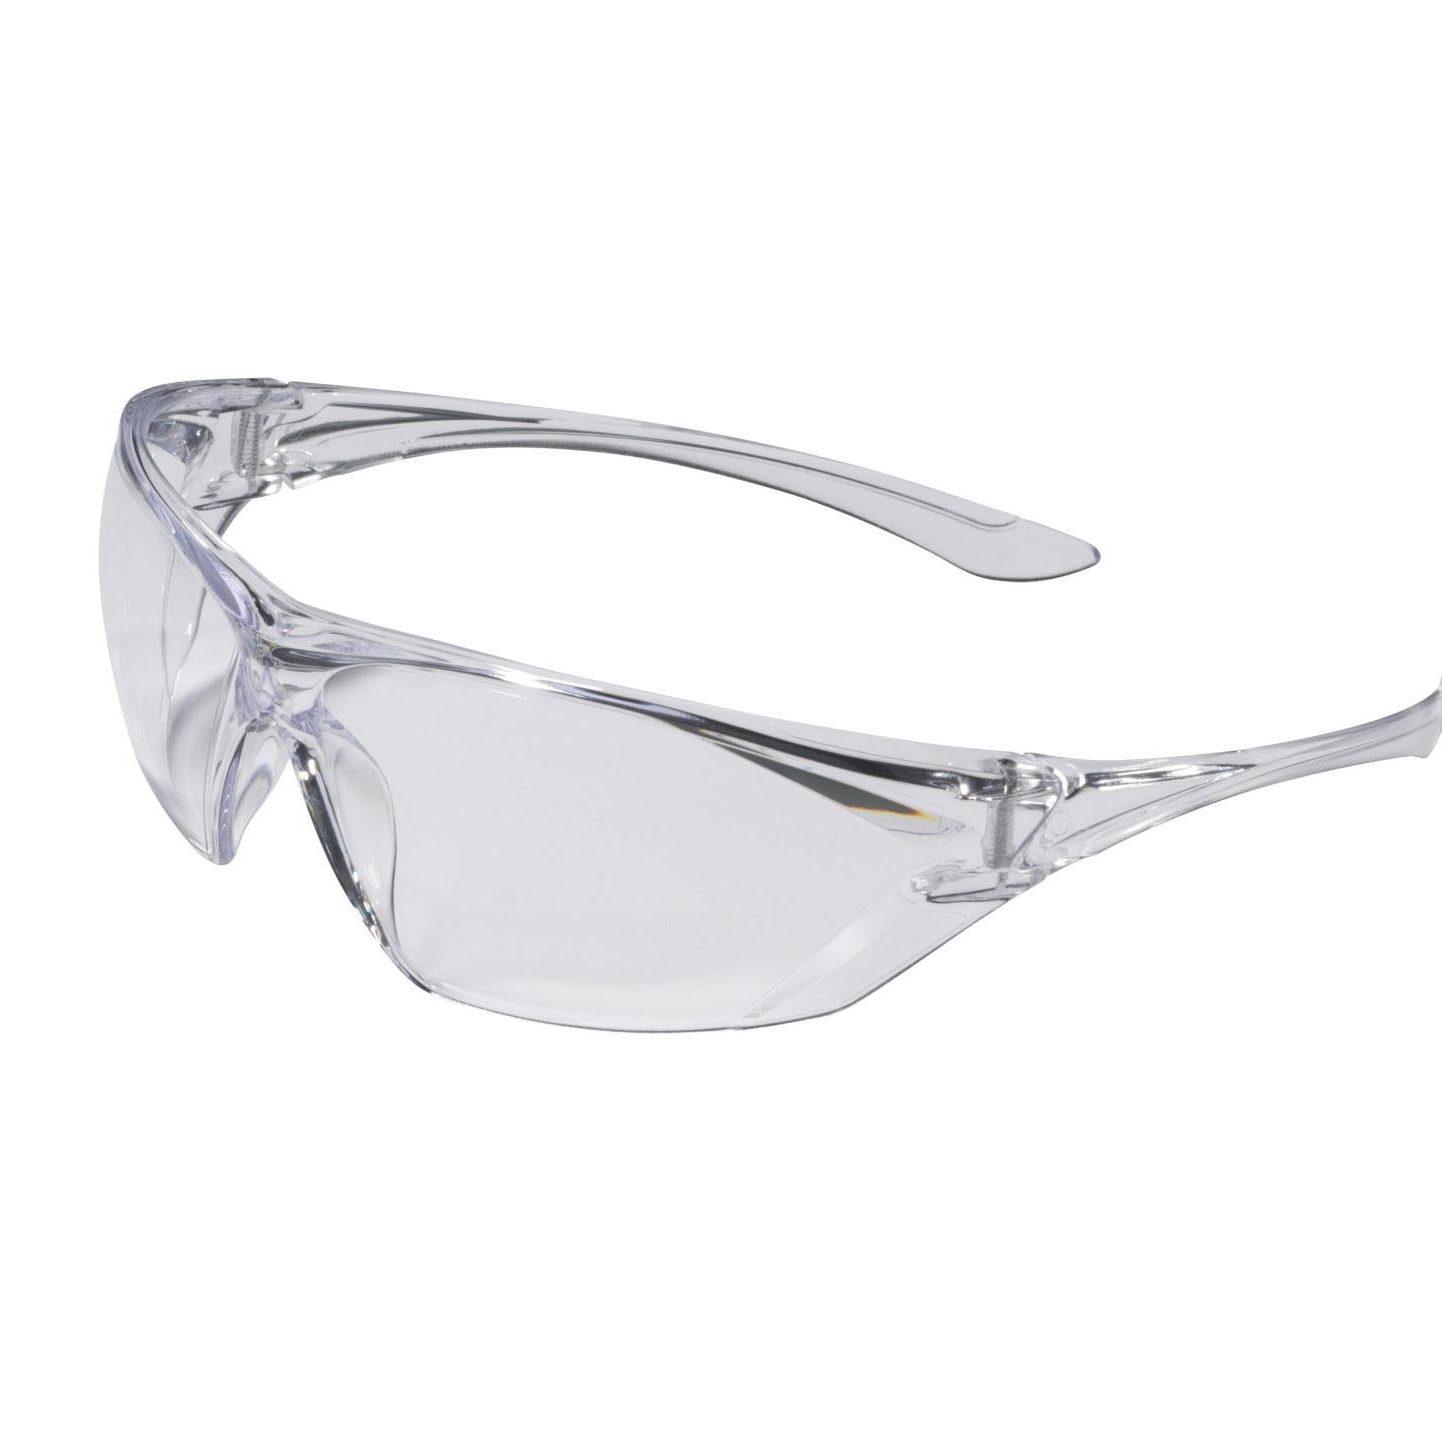 Types of Eyewear Safety Glasses